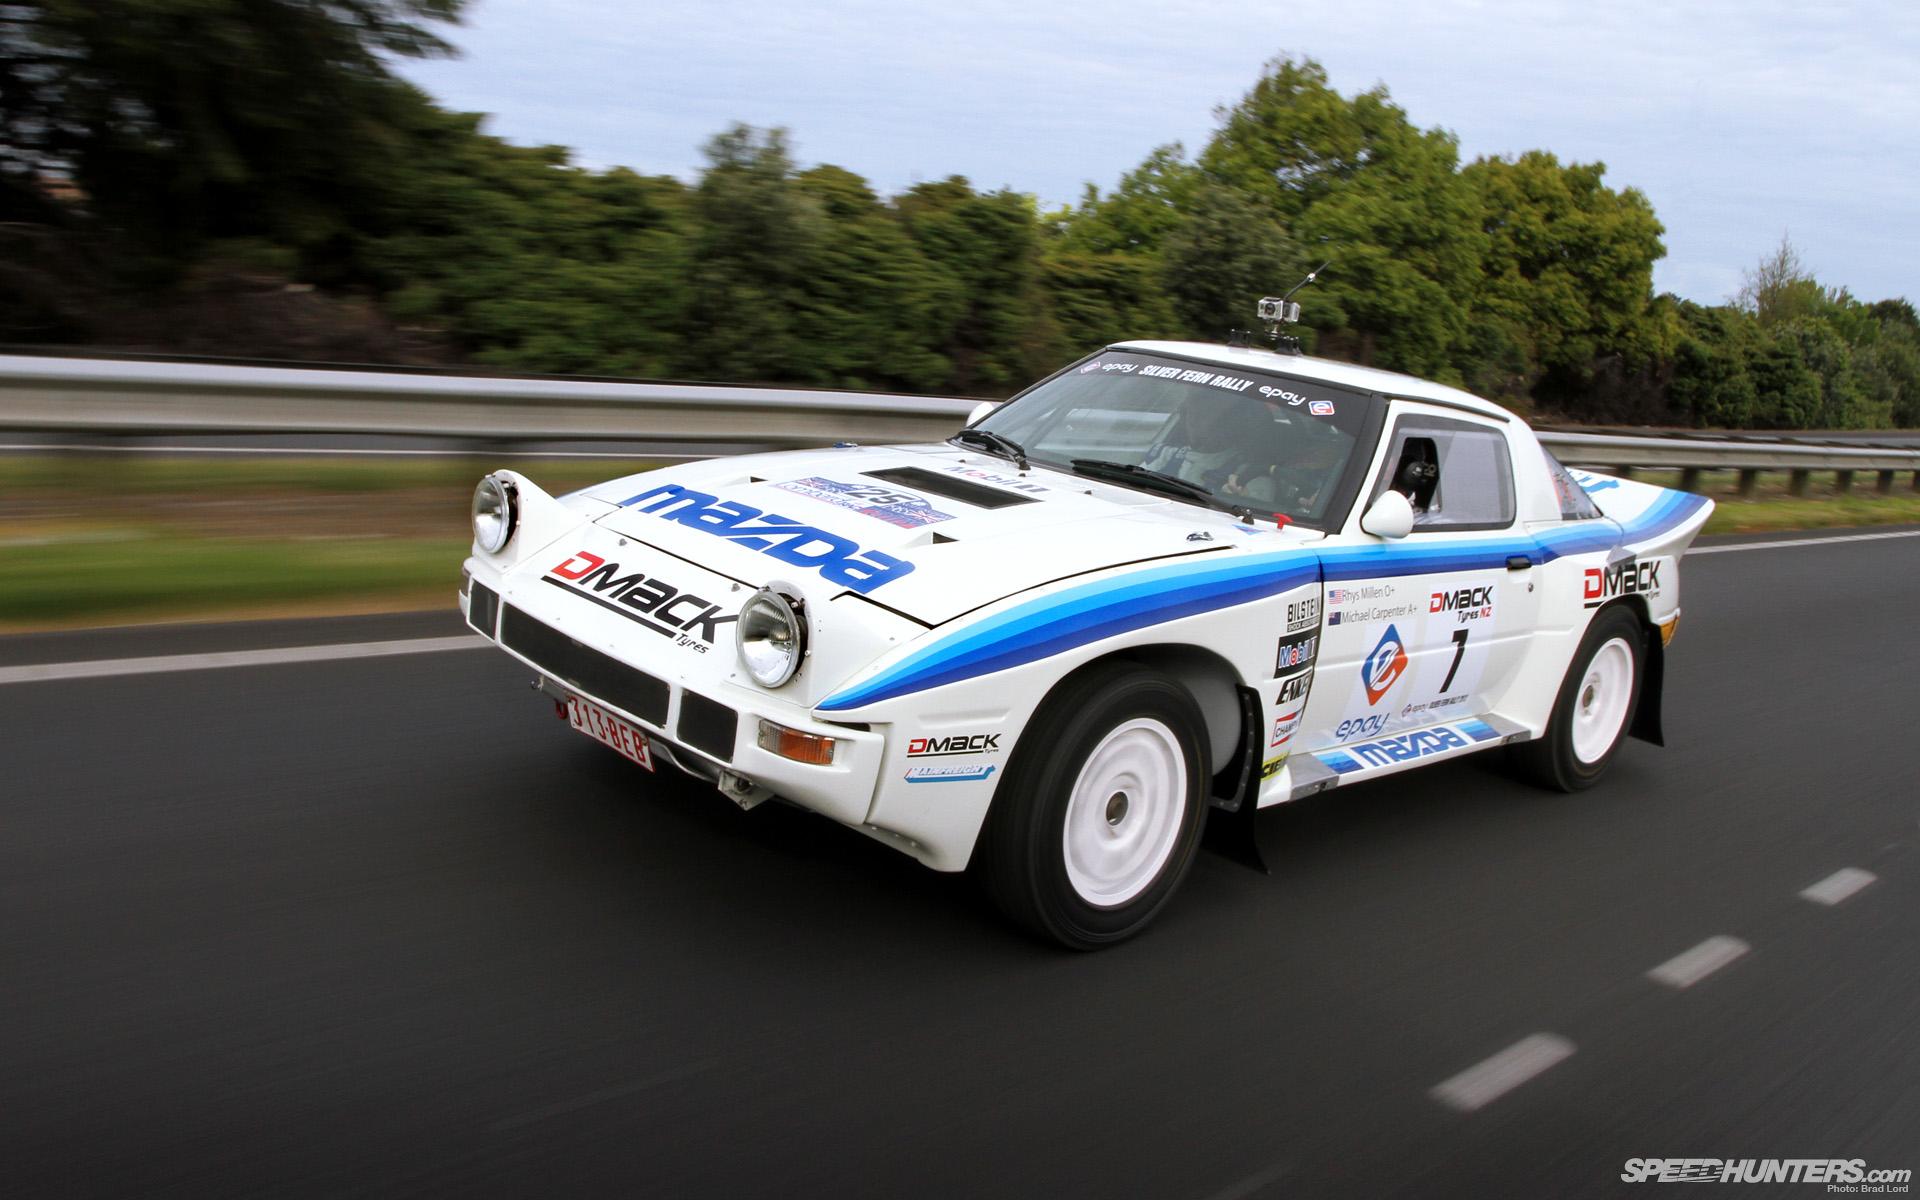 Retro Rally Rhys Millen S Group B Rx 7 Speedhunters